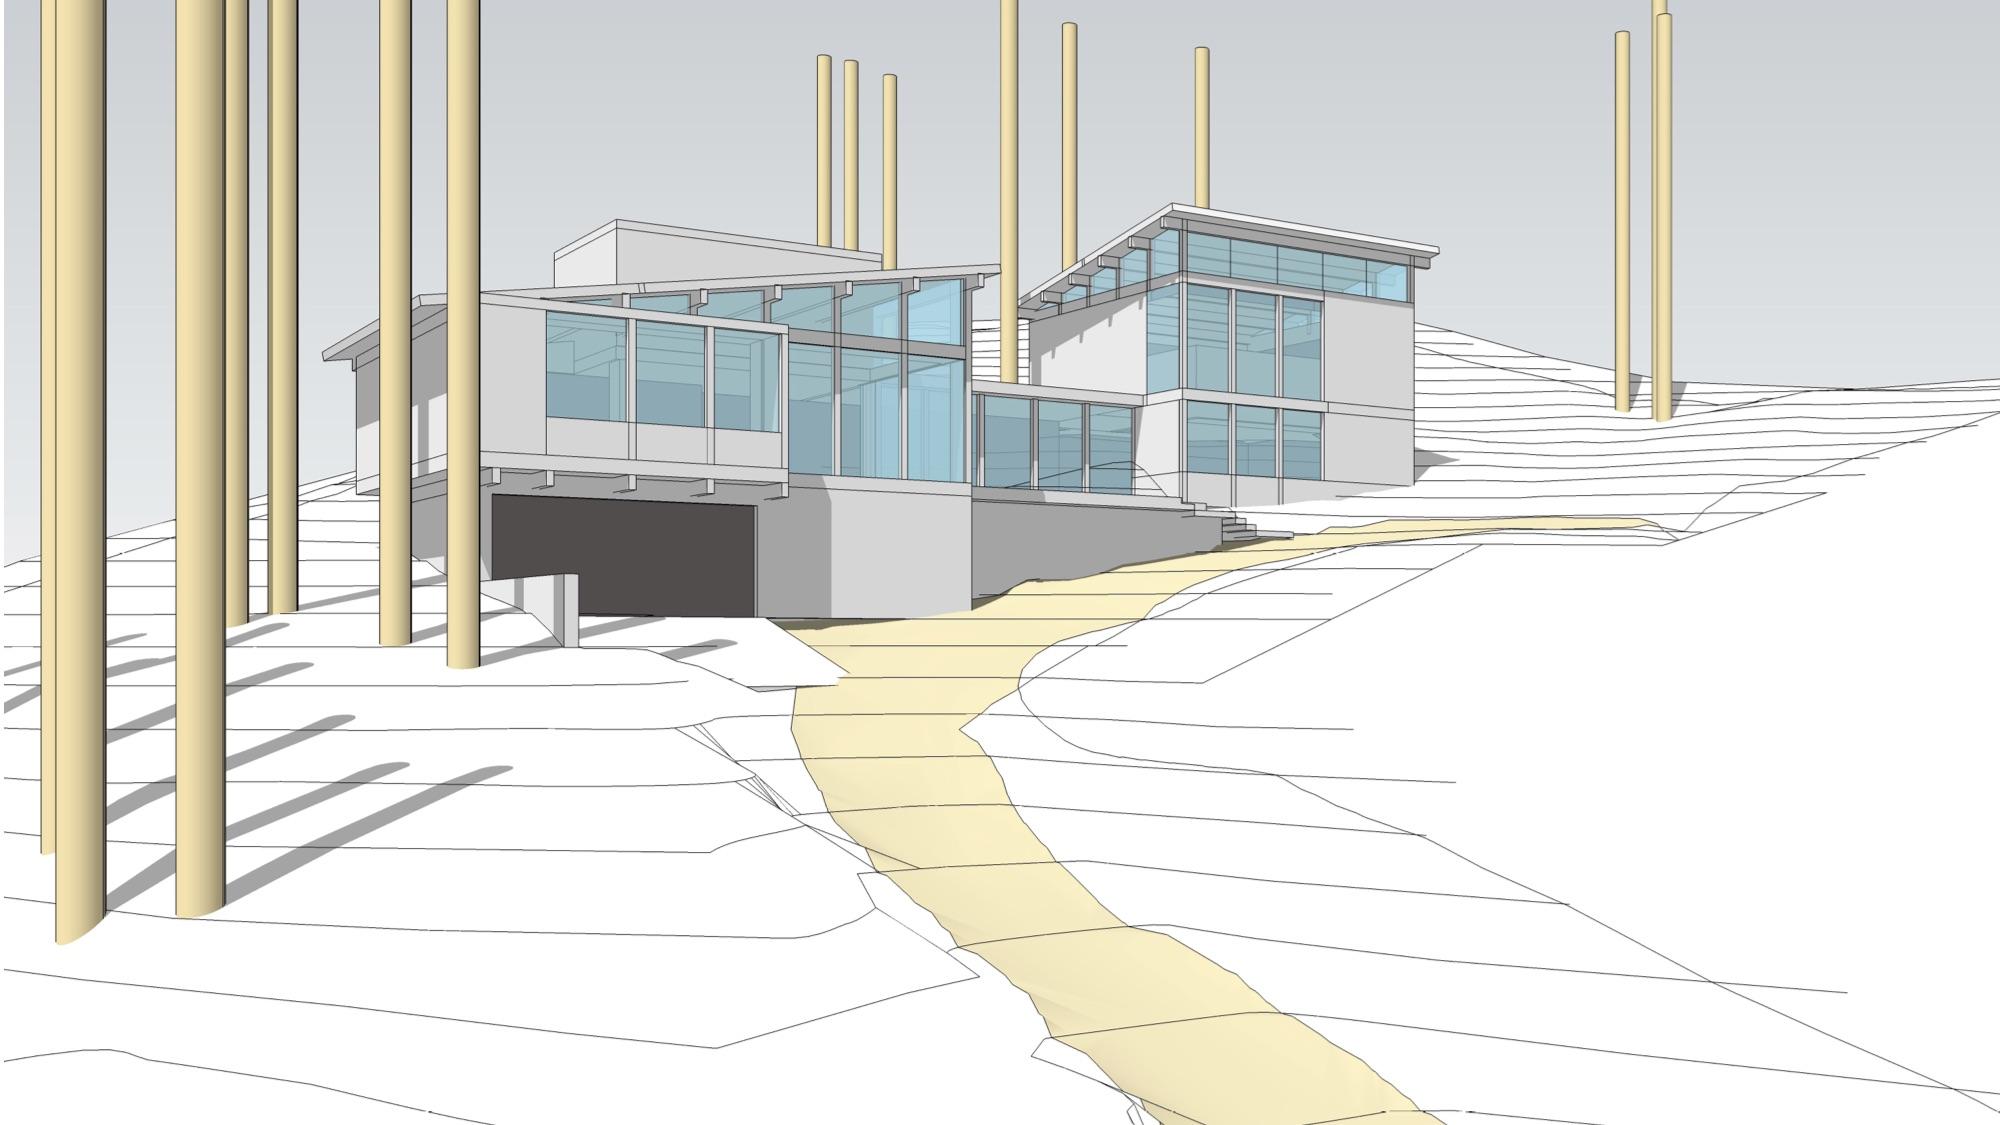 3500 square foot steep slope design: Sammamish, WA